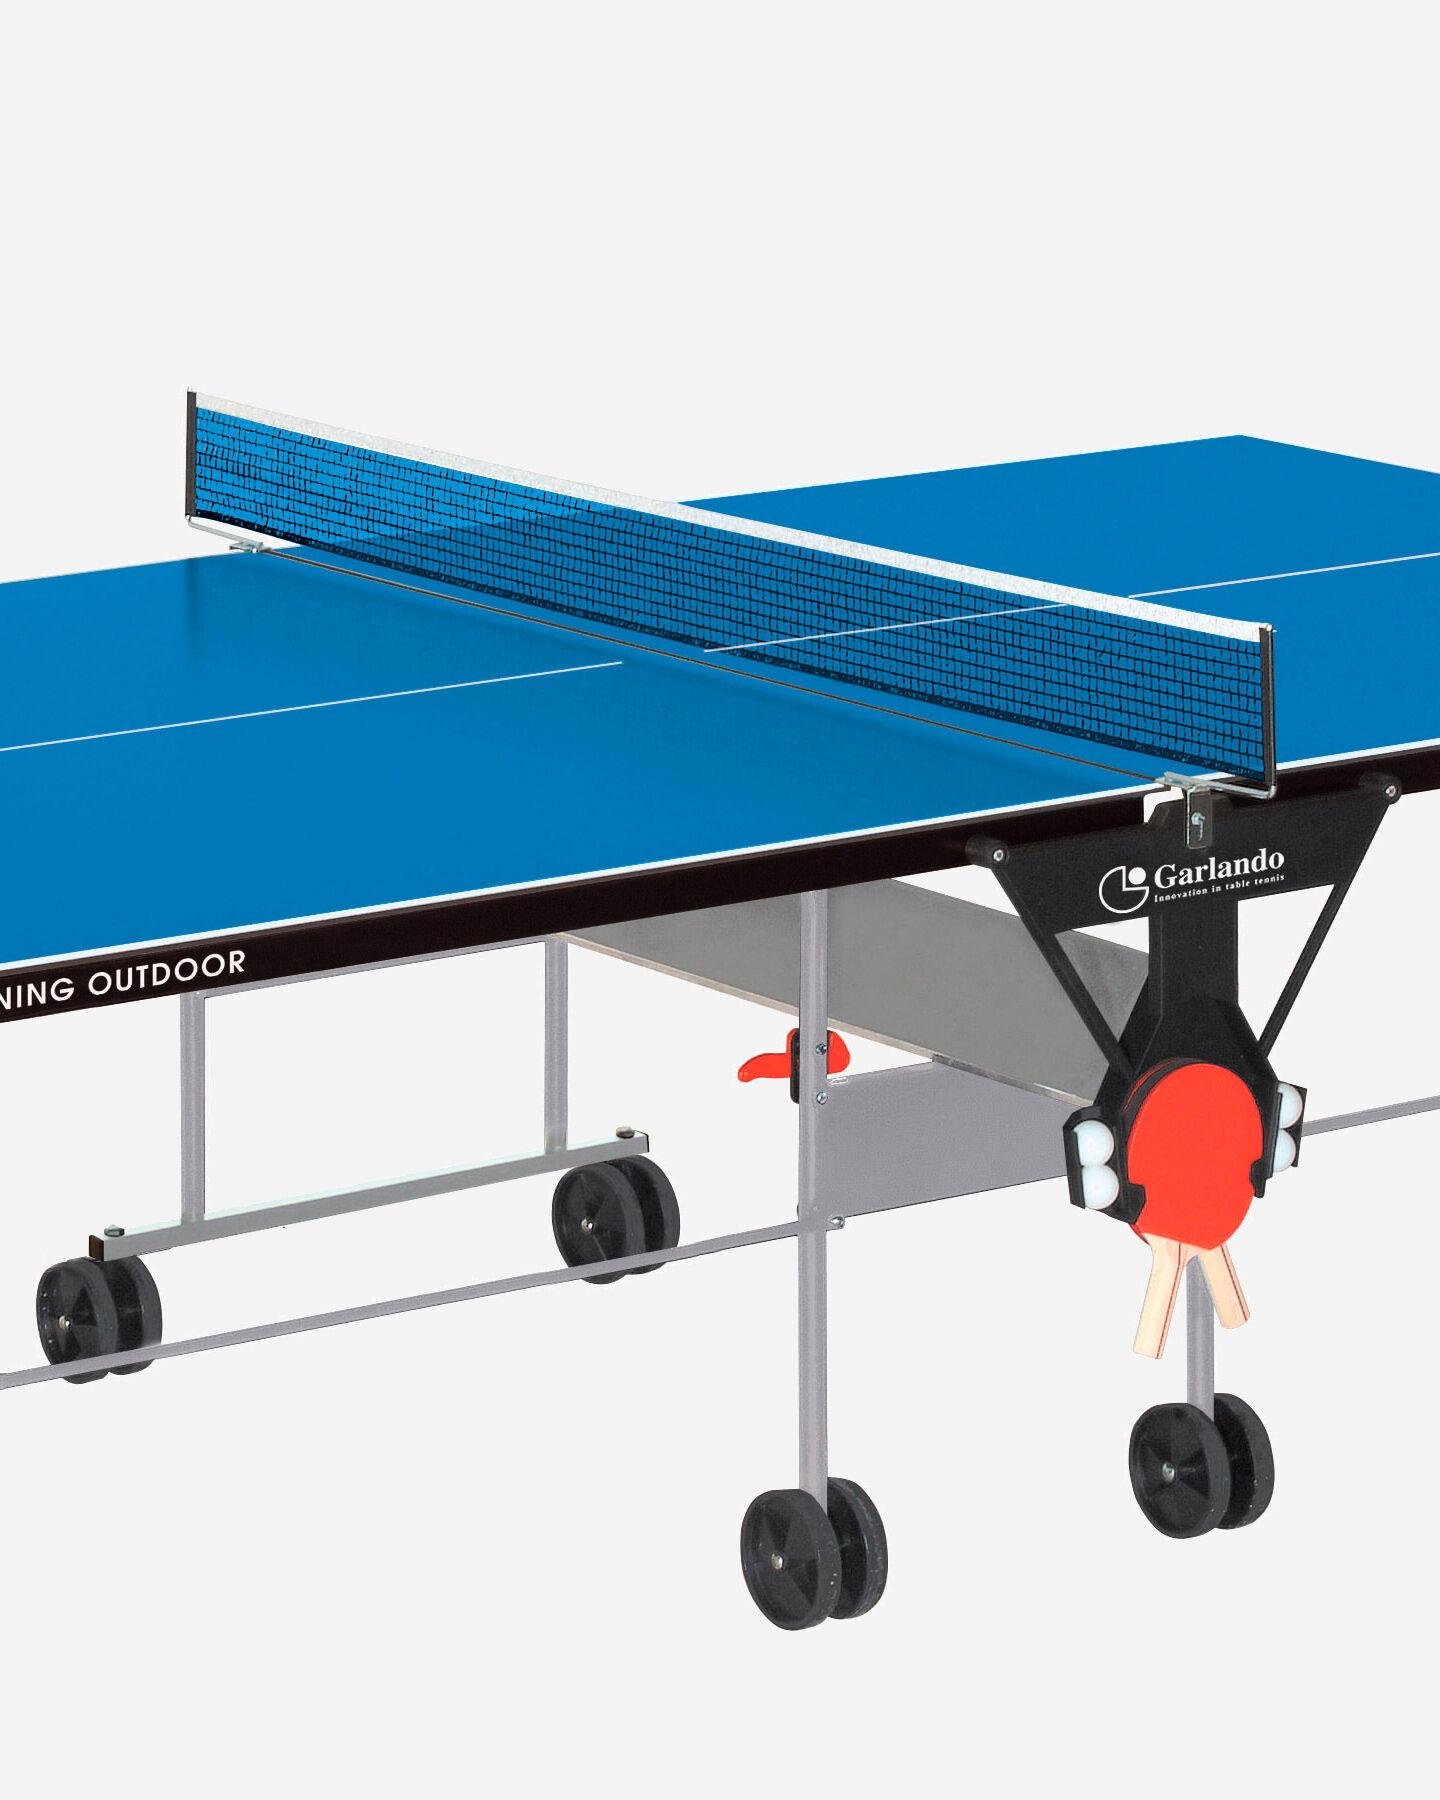 Tavolo ping pong GARLANDO TRAINING OUTDOOR S1222908|N.D.|UNI scatto 1